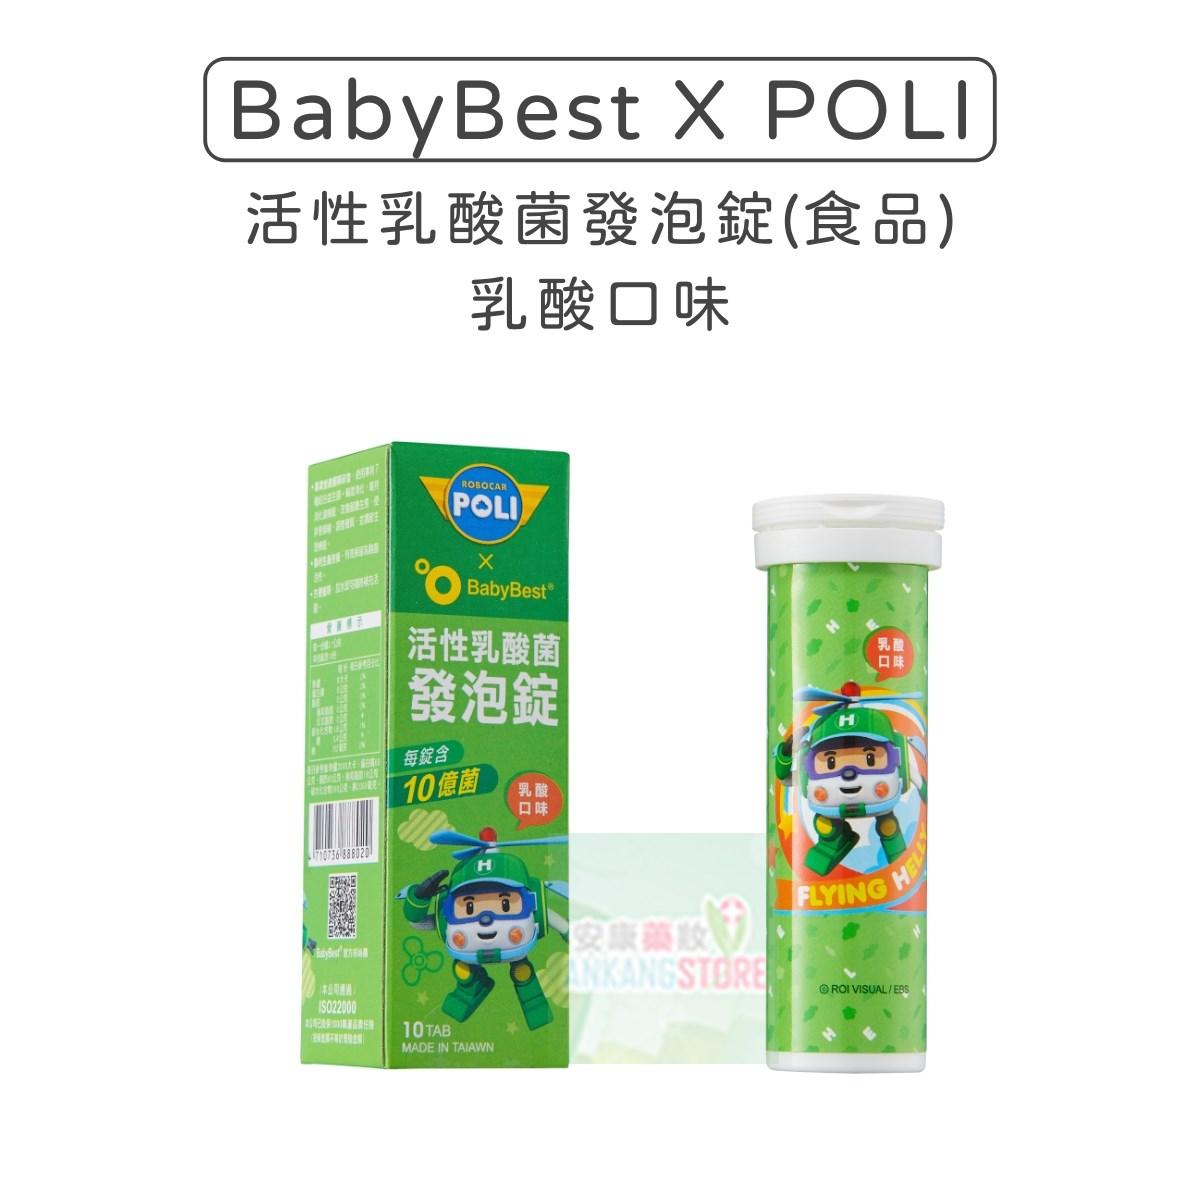 BabyBest X Poly 活性乳酸菌發泡錠-4種口味可選